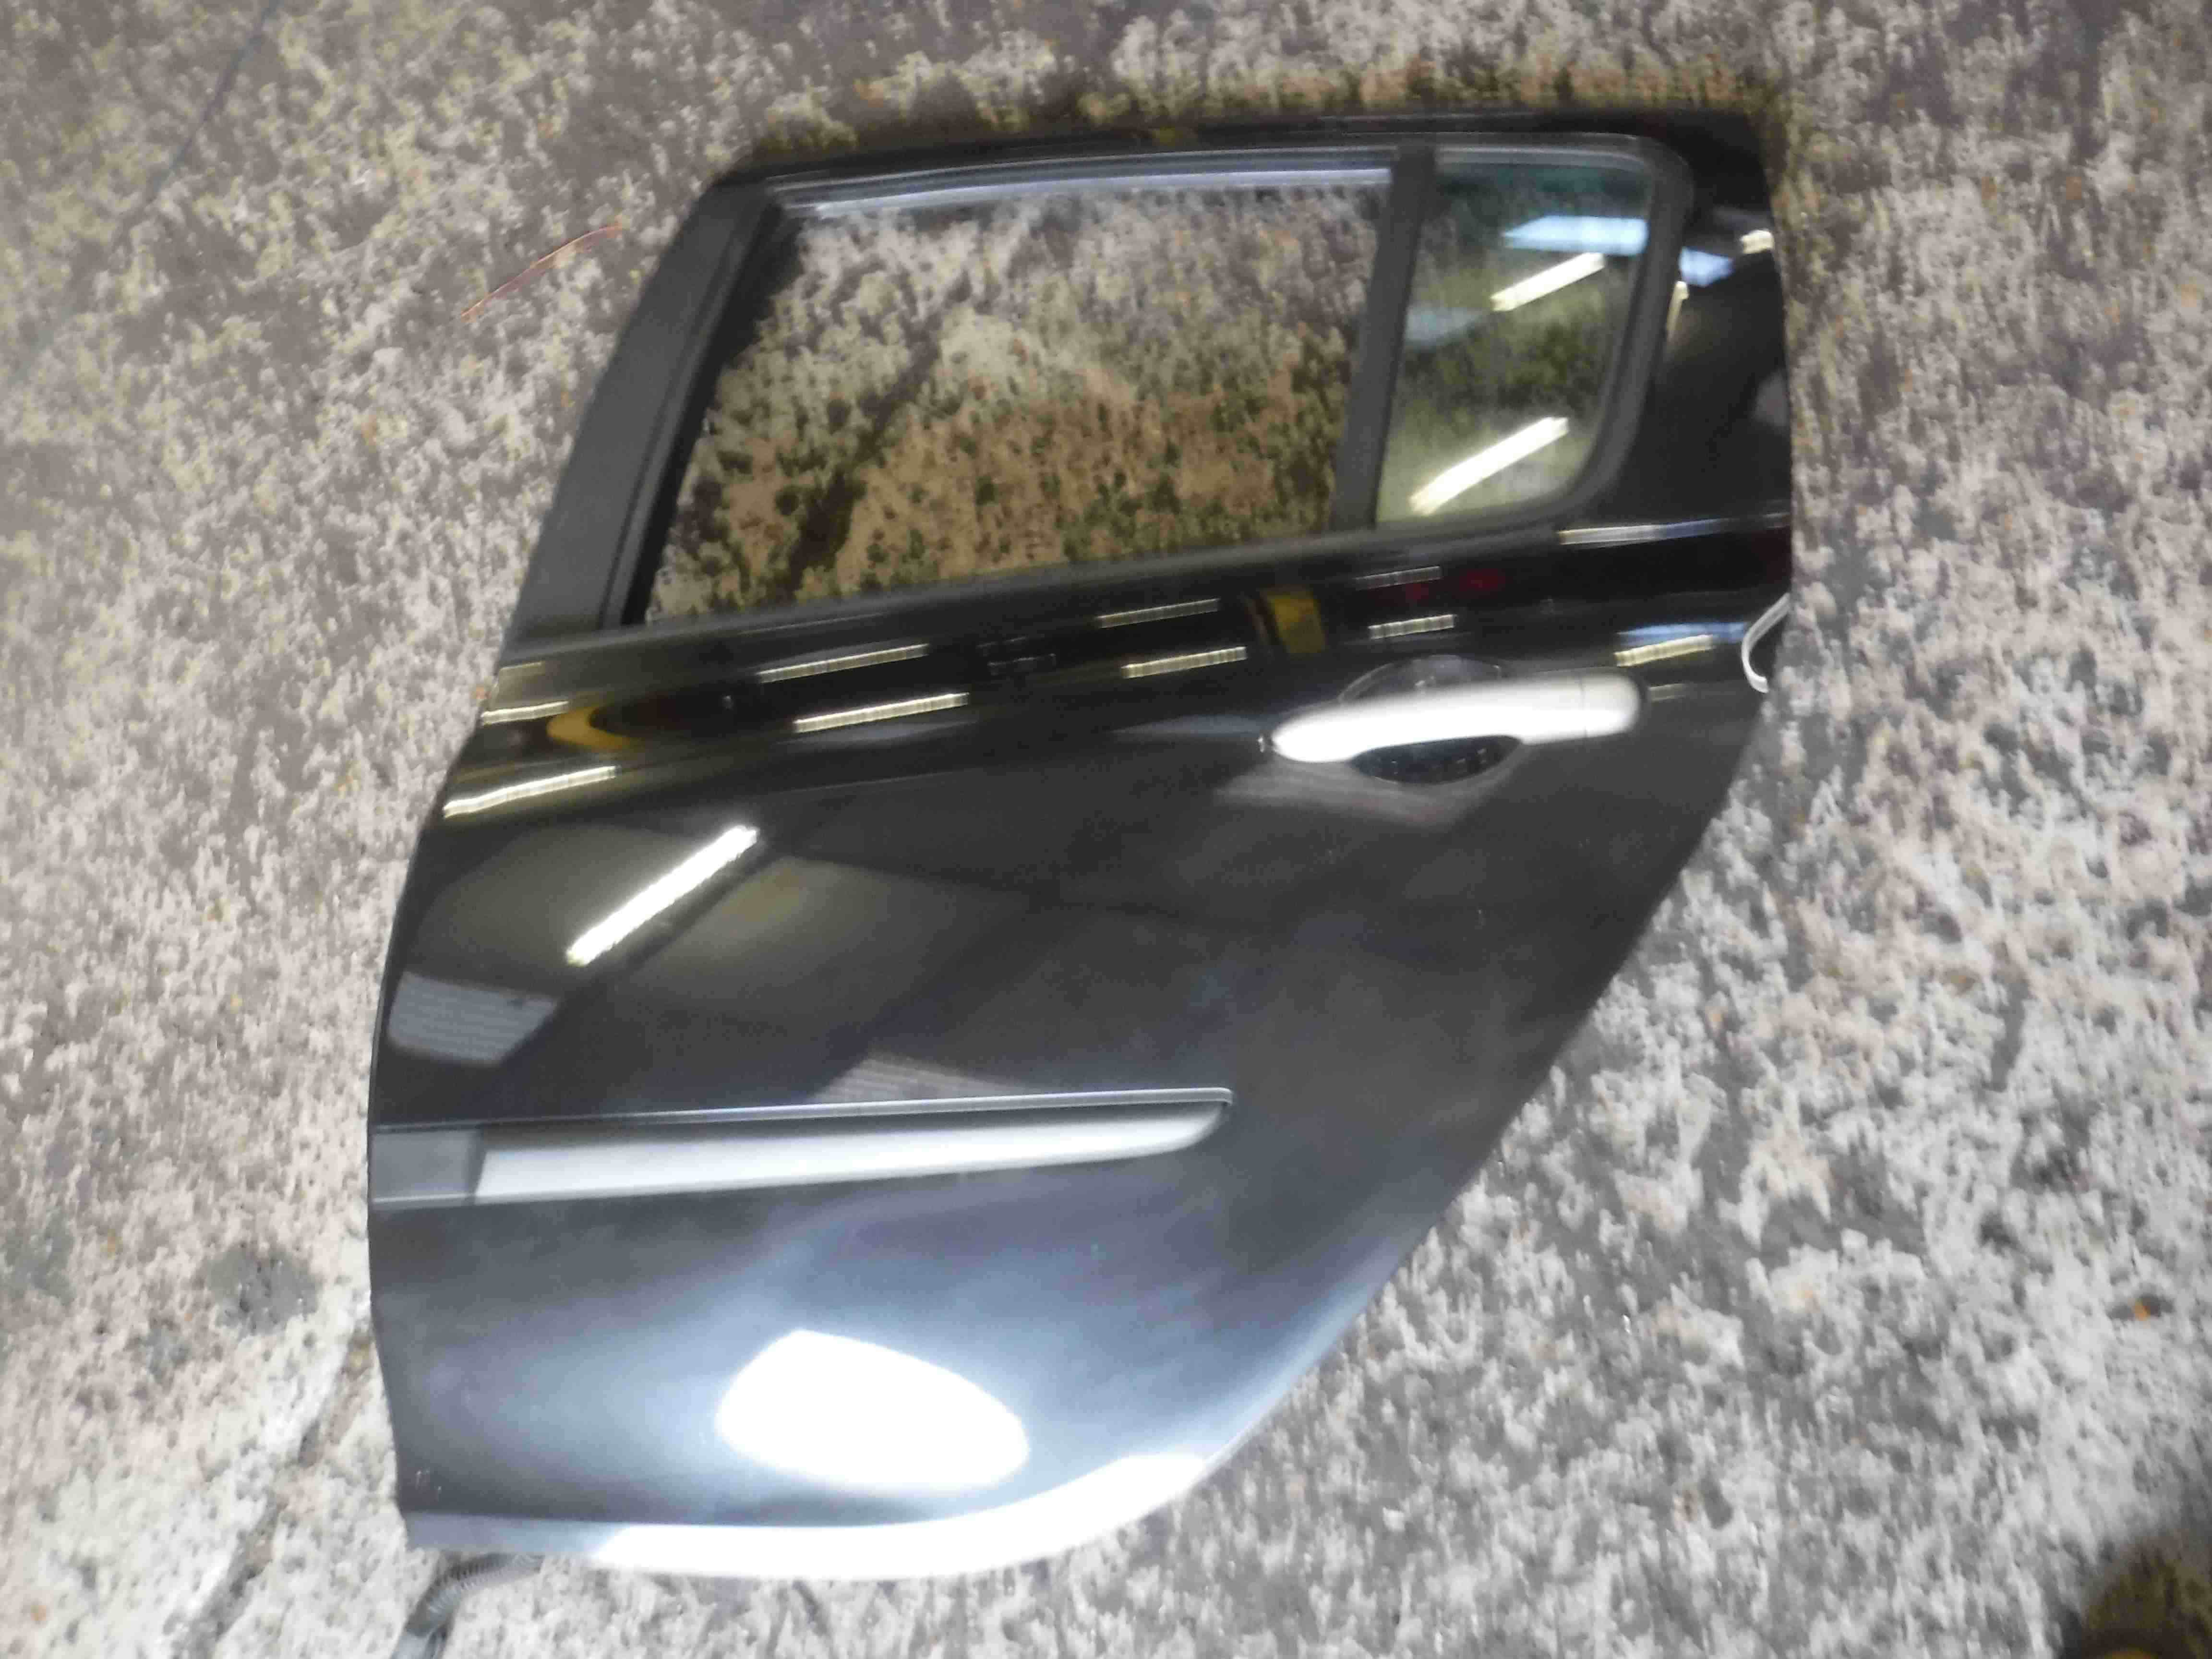 Renault Clio MK3 2005-2012 Passenger NSR Rear Door Black 676 5dr